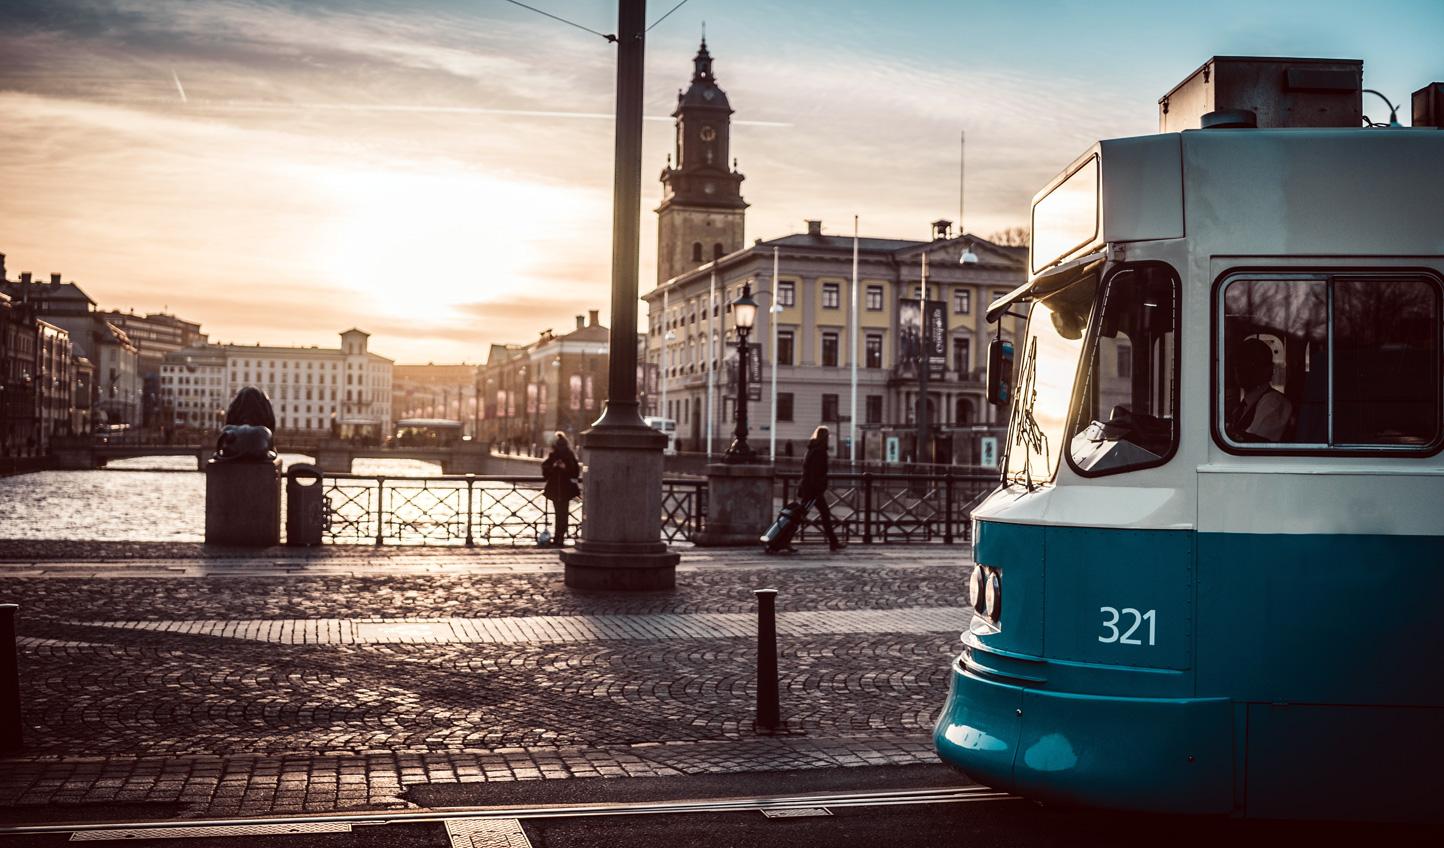 Trams through the city